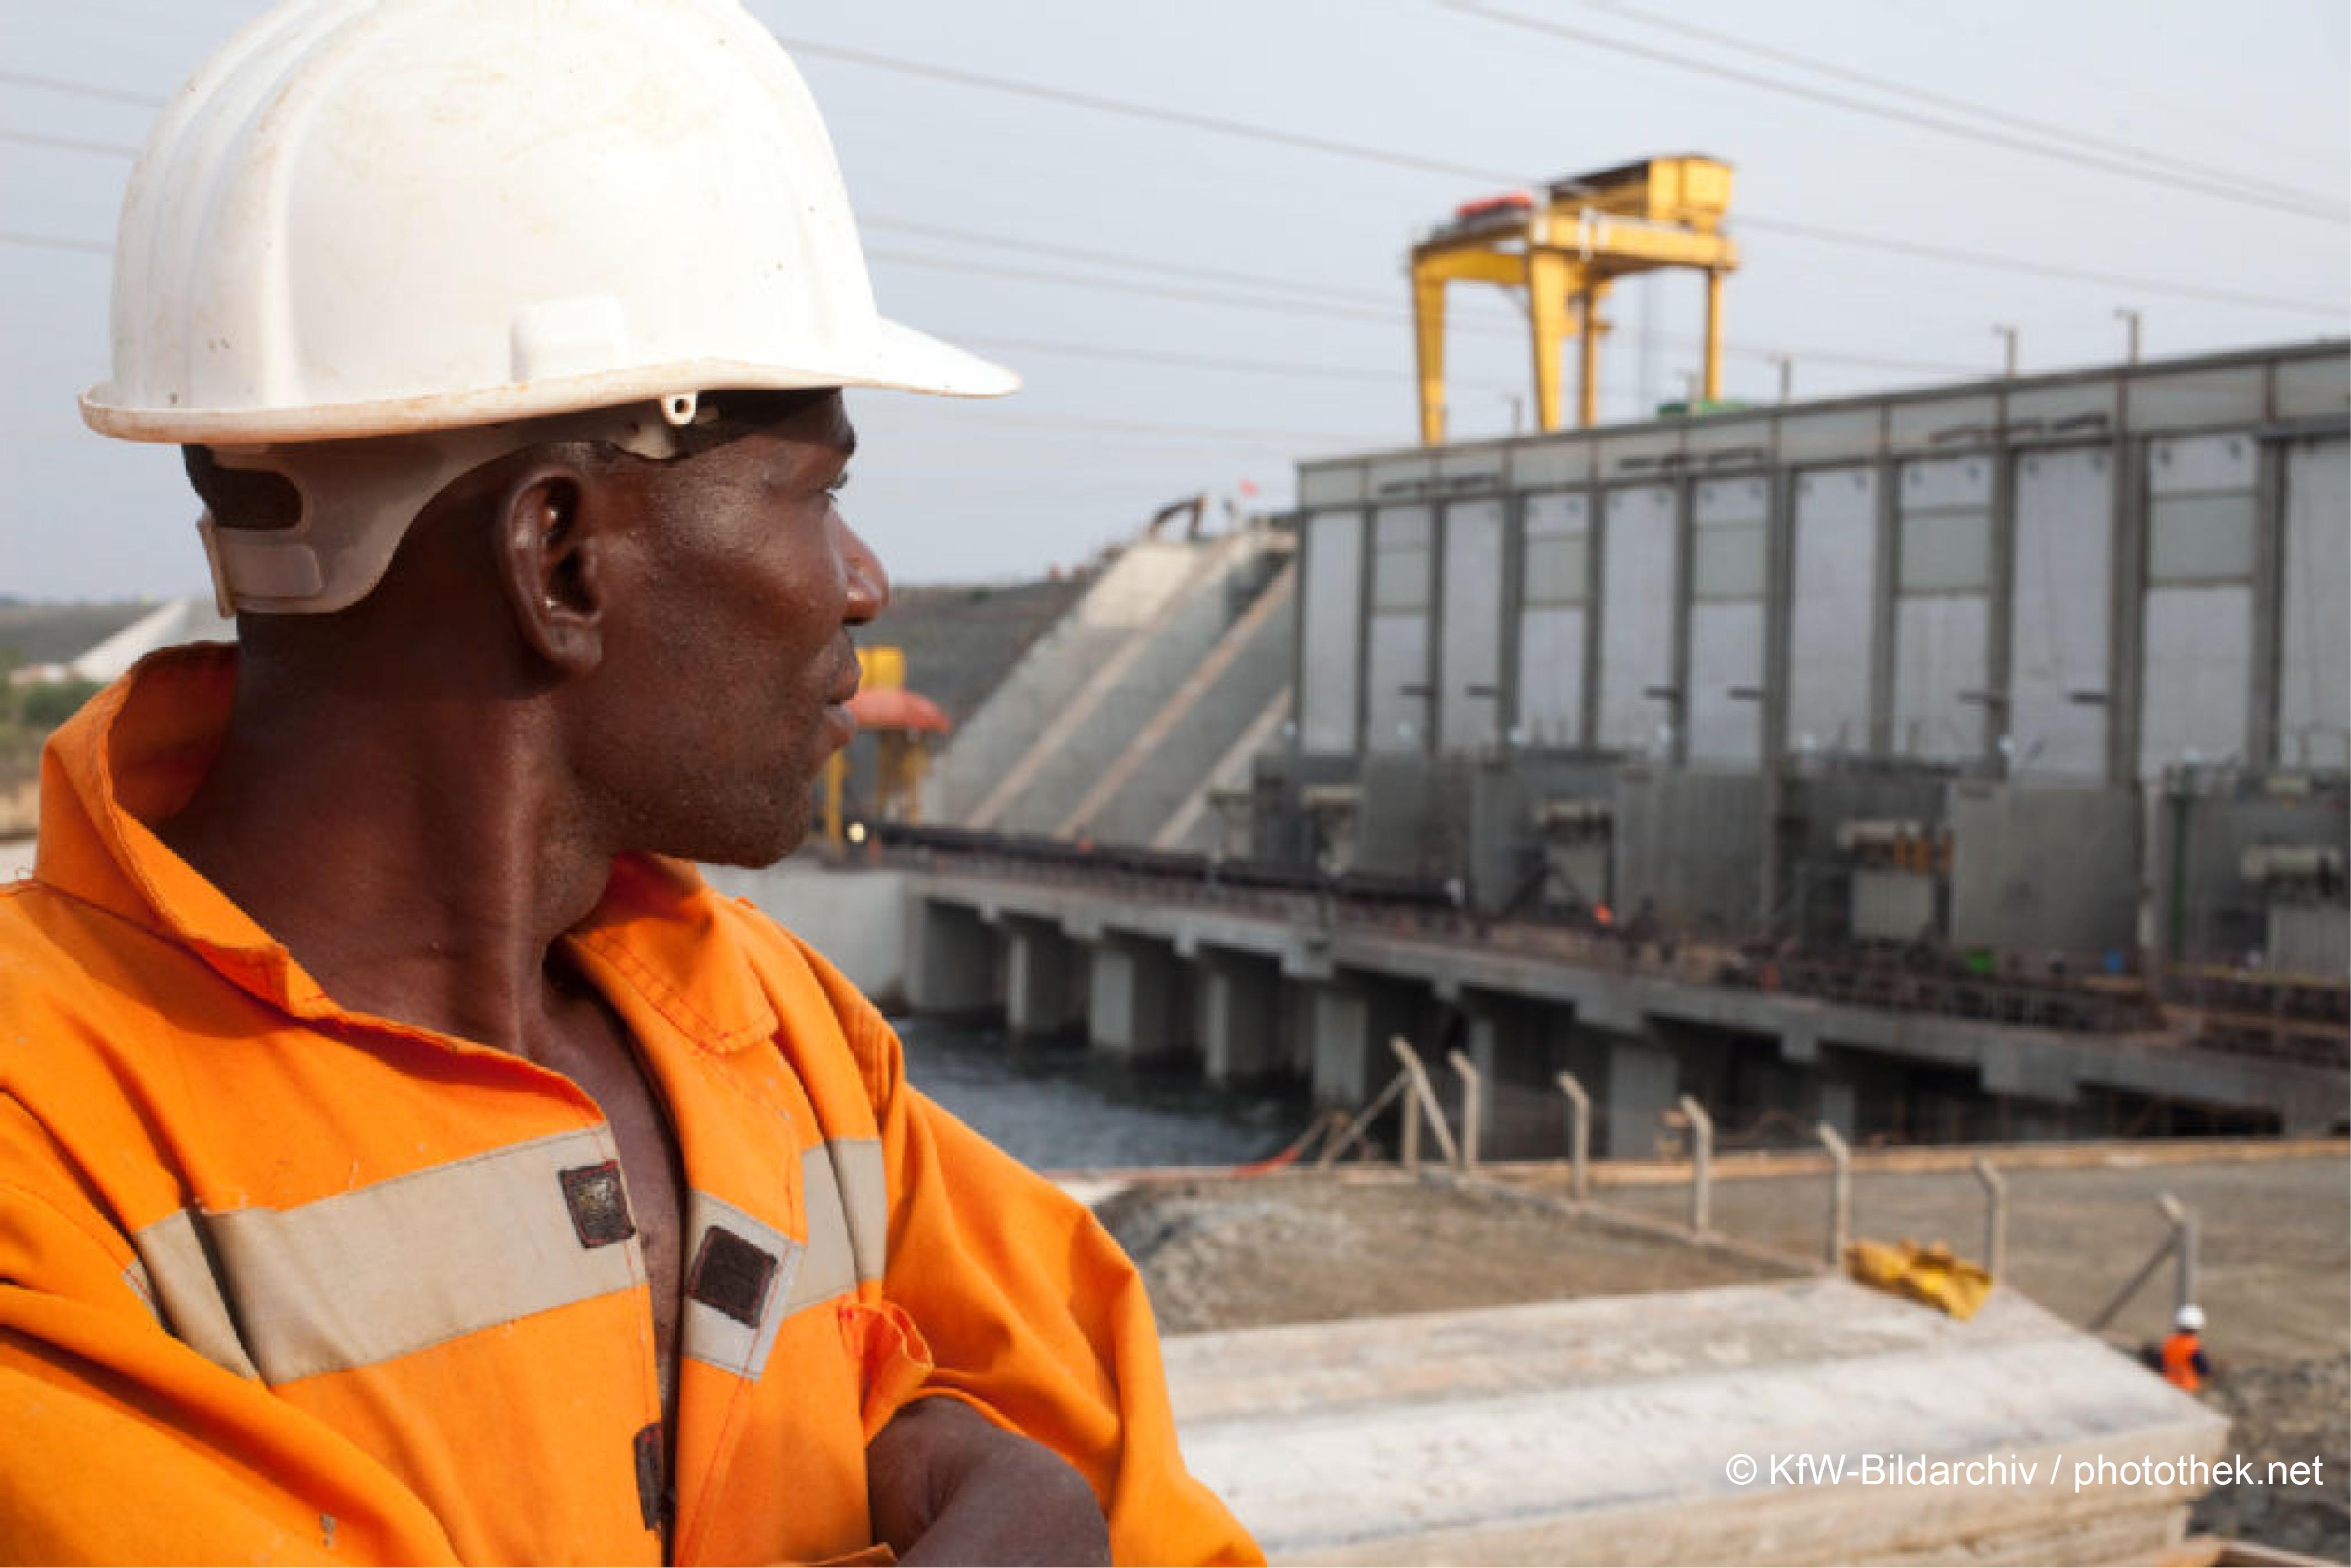 Bauarbeiter schaut zu Baustelle